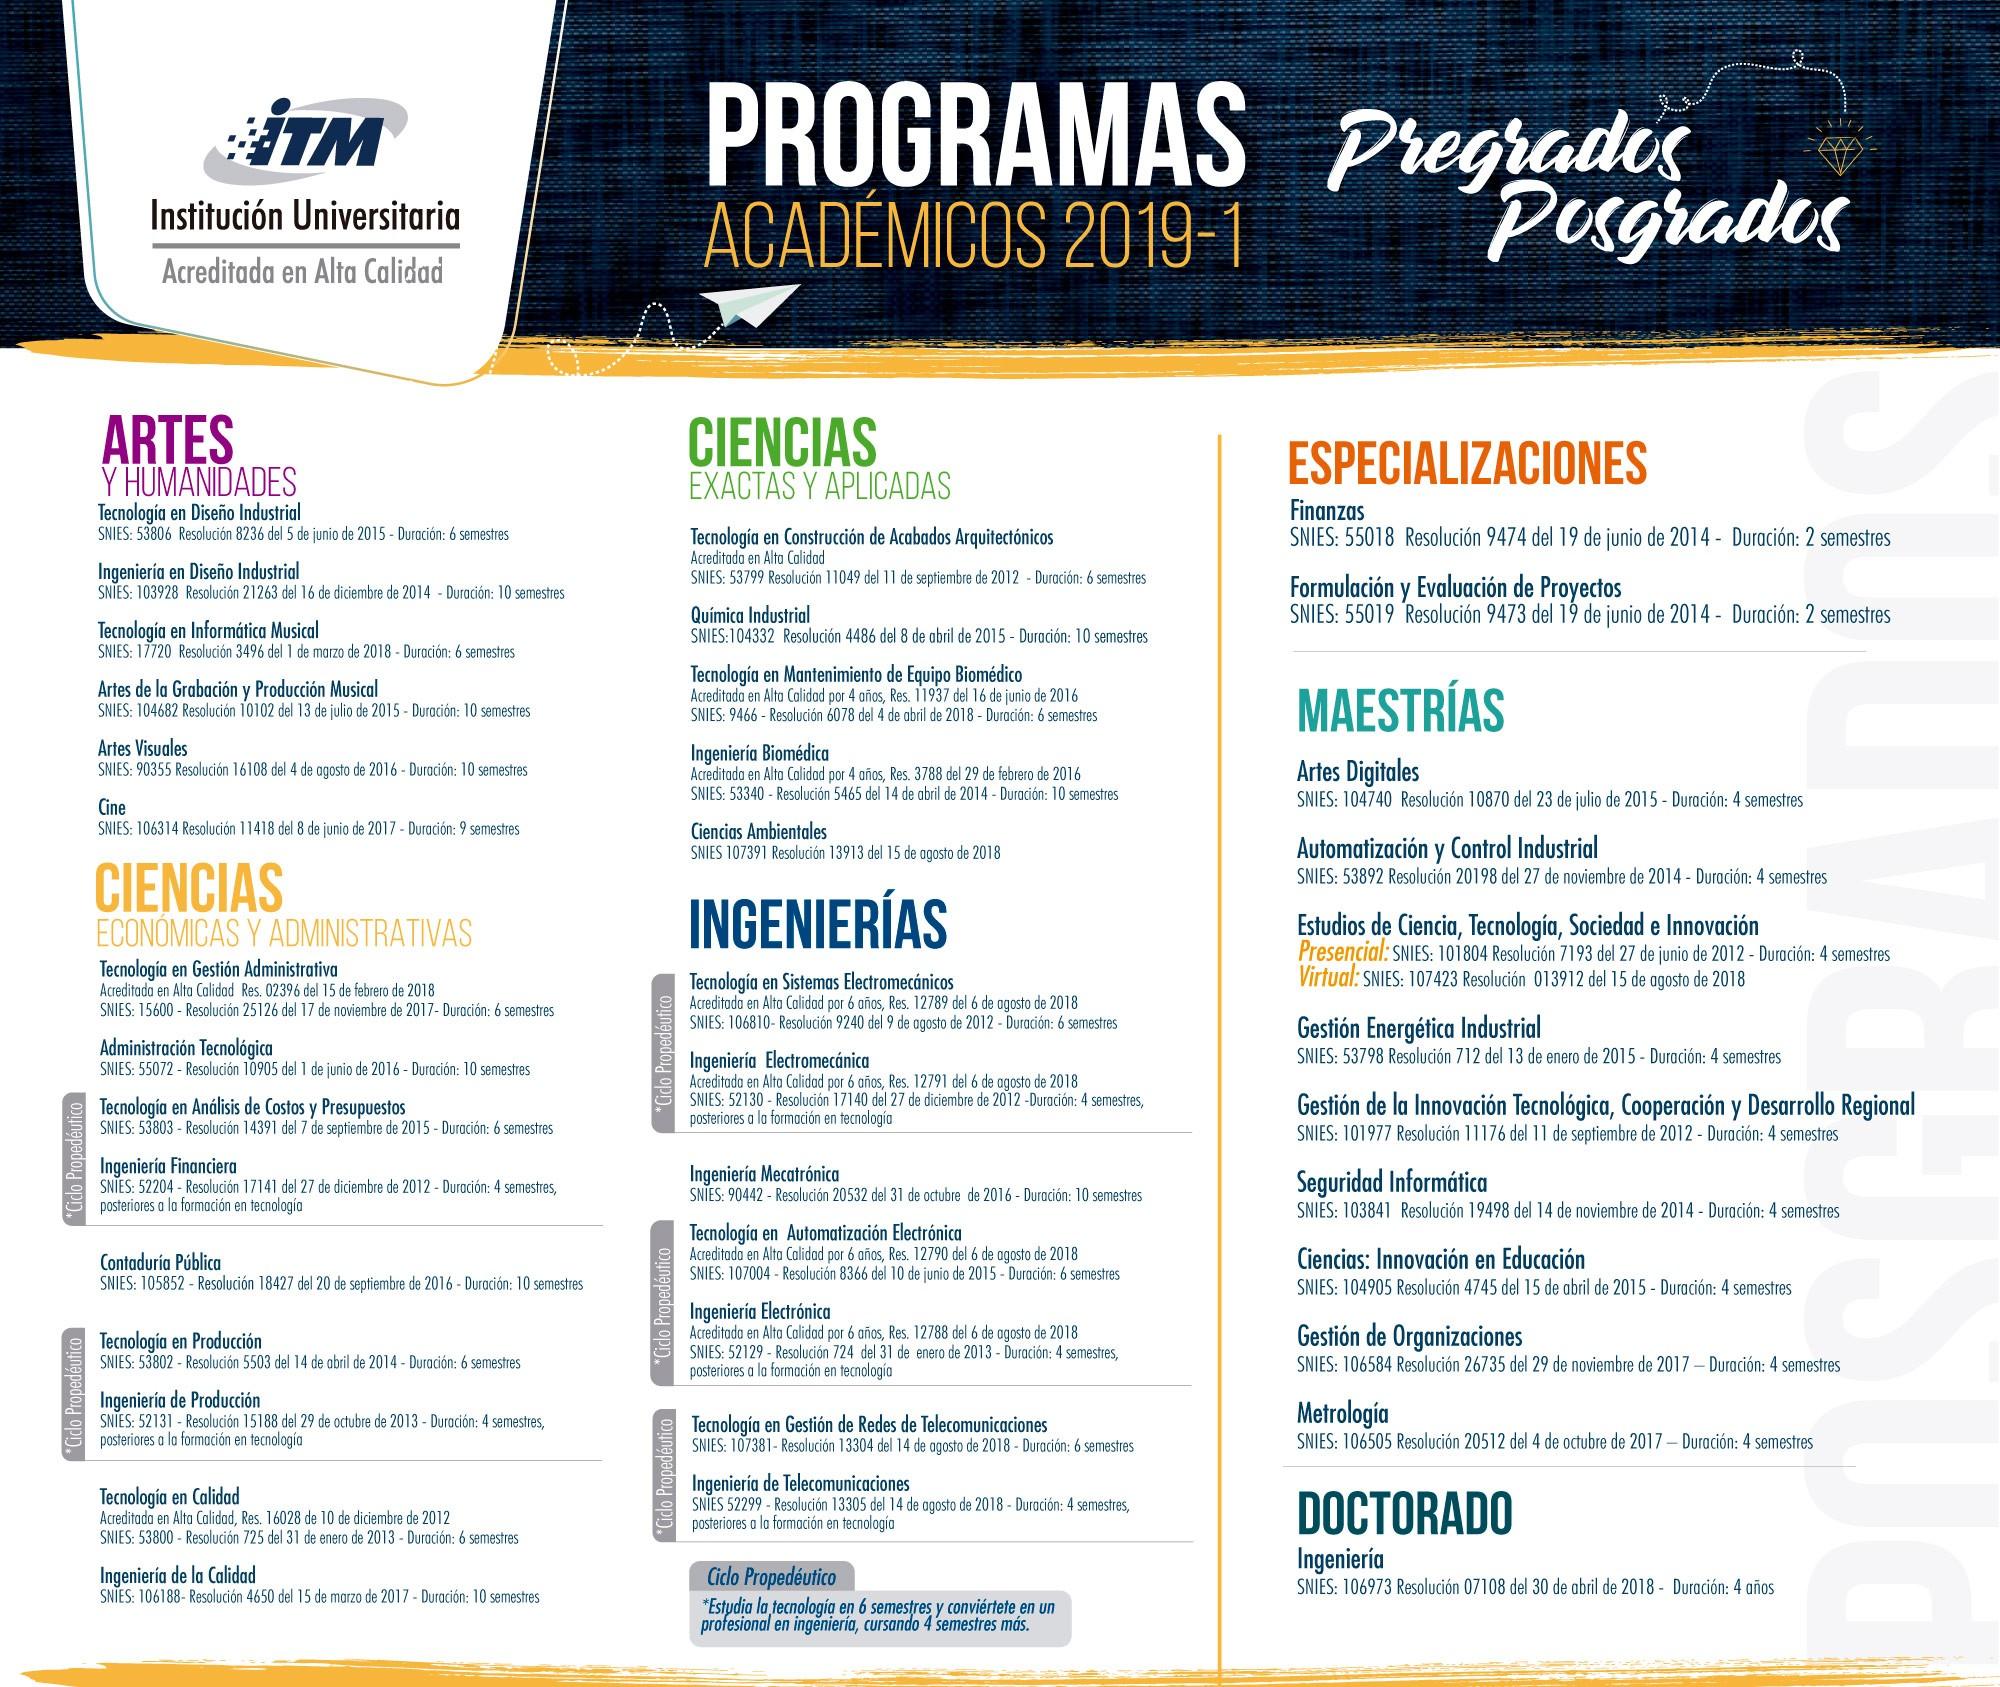 Programas Académicos